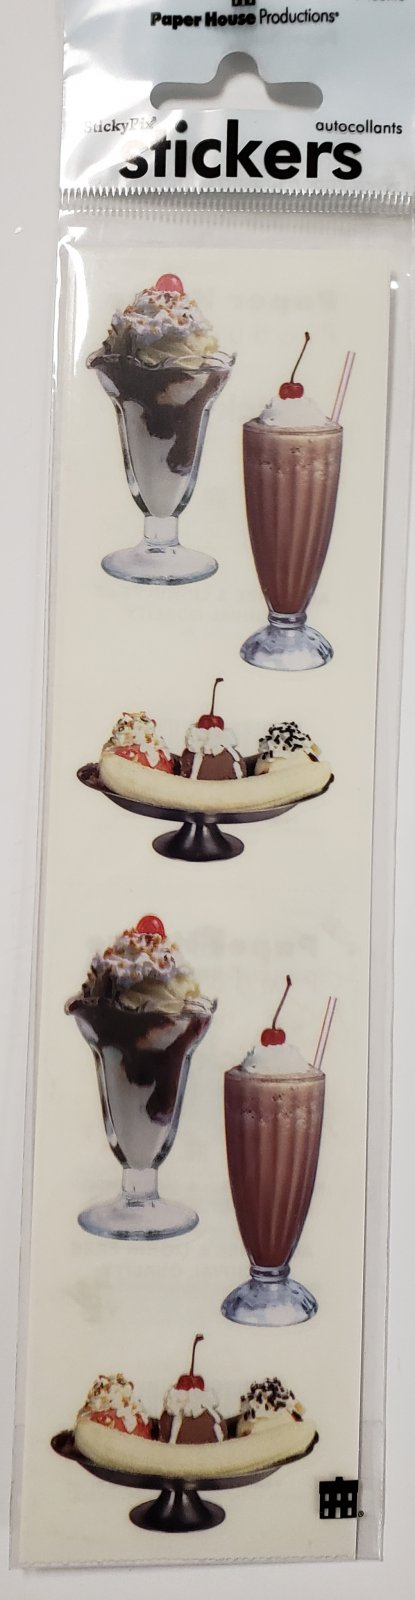 Paper House Ice Cream Sundaes